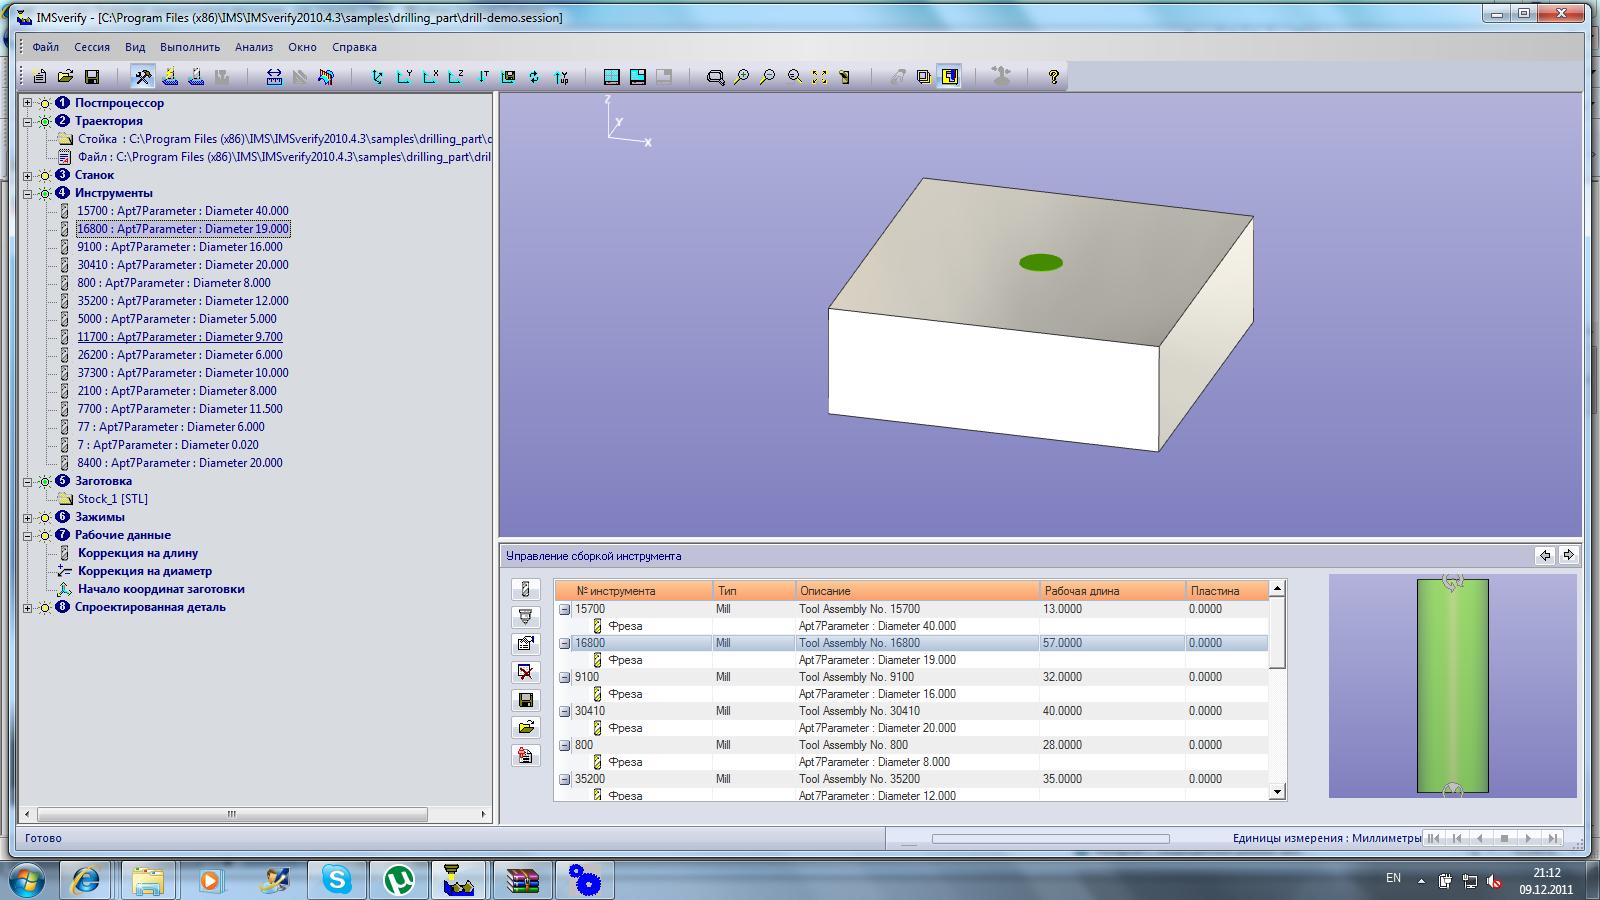 Working with IMSverify 2010 v4.3 full